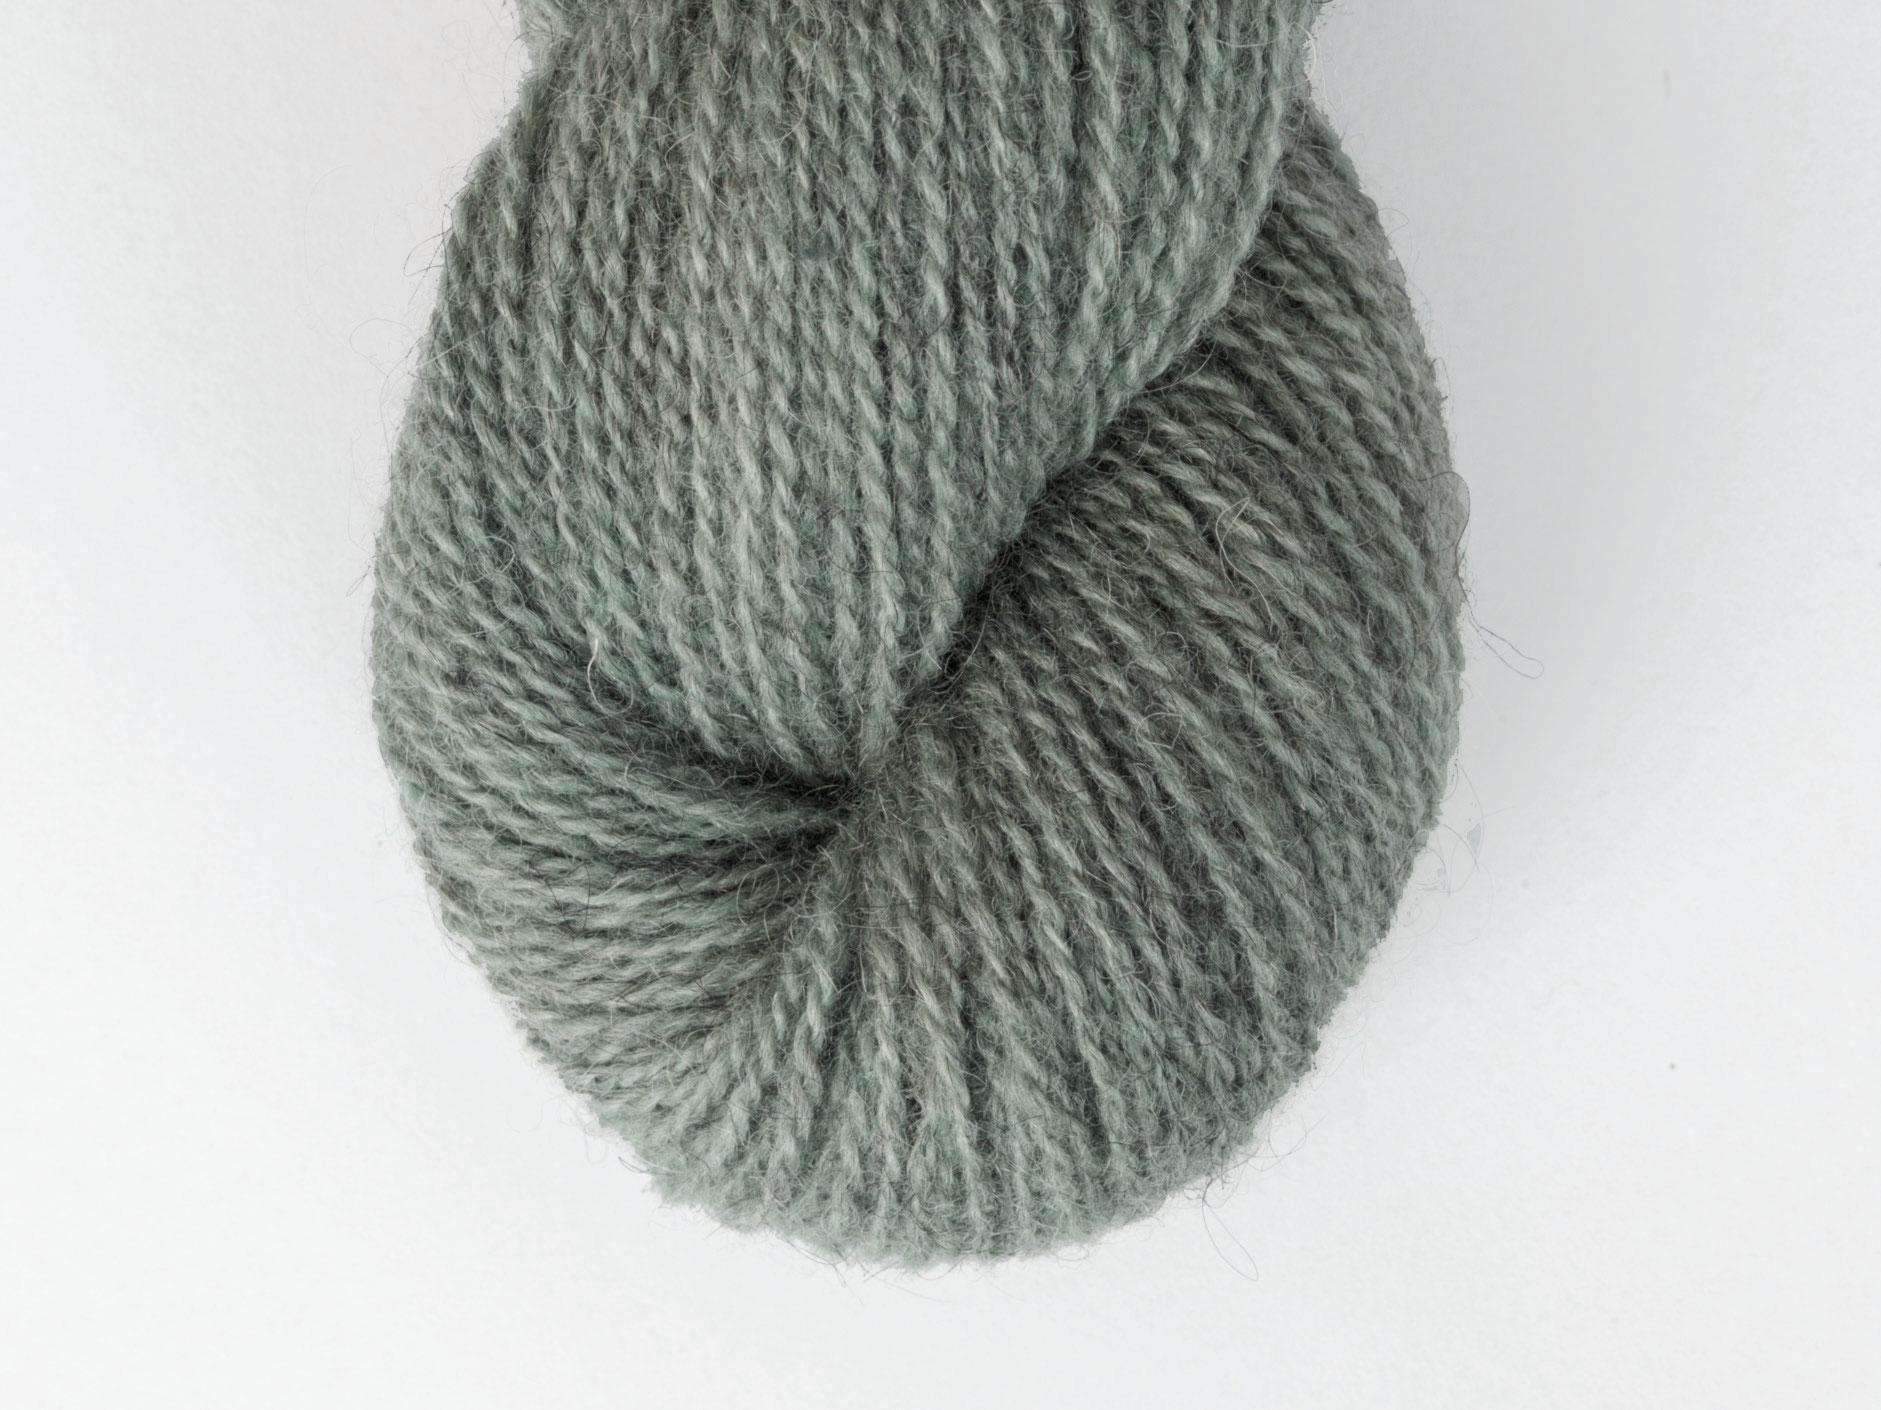 Bohus Stickning garn yarn BS wool 114 dark gray green